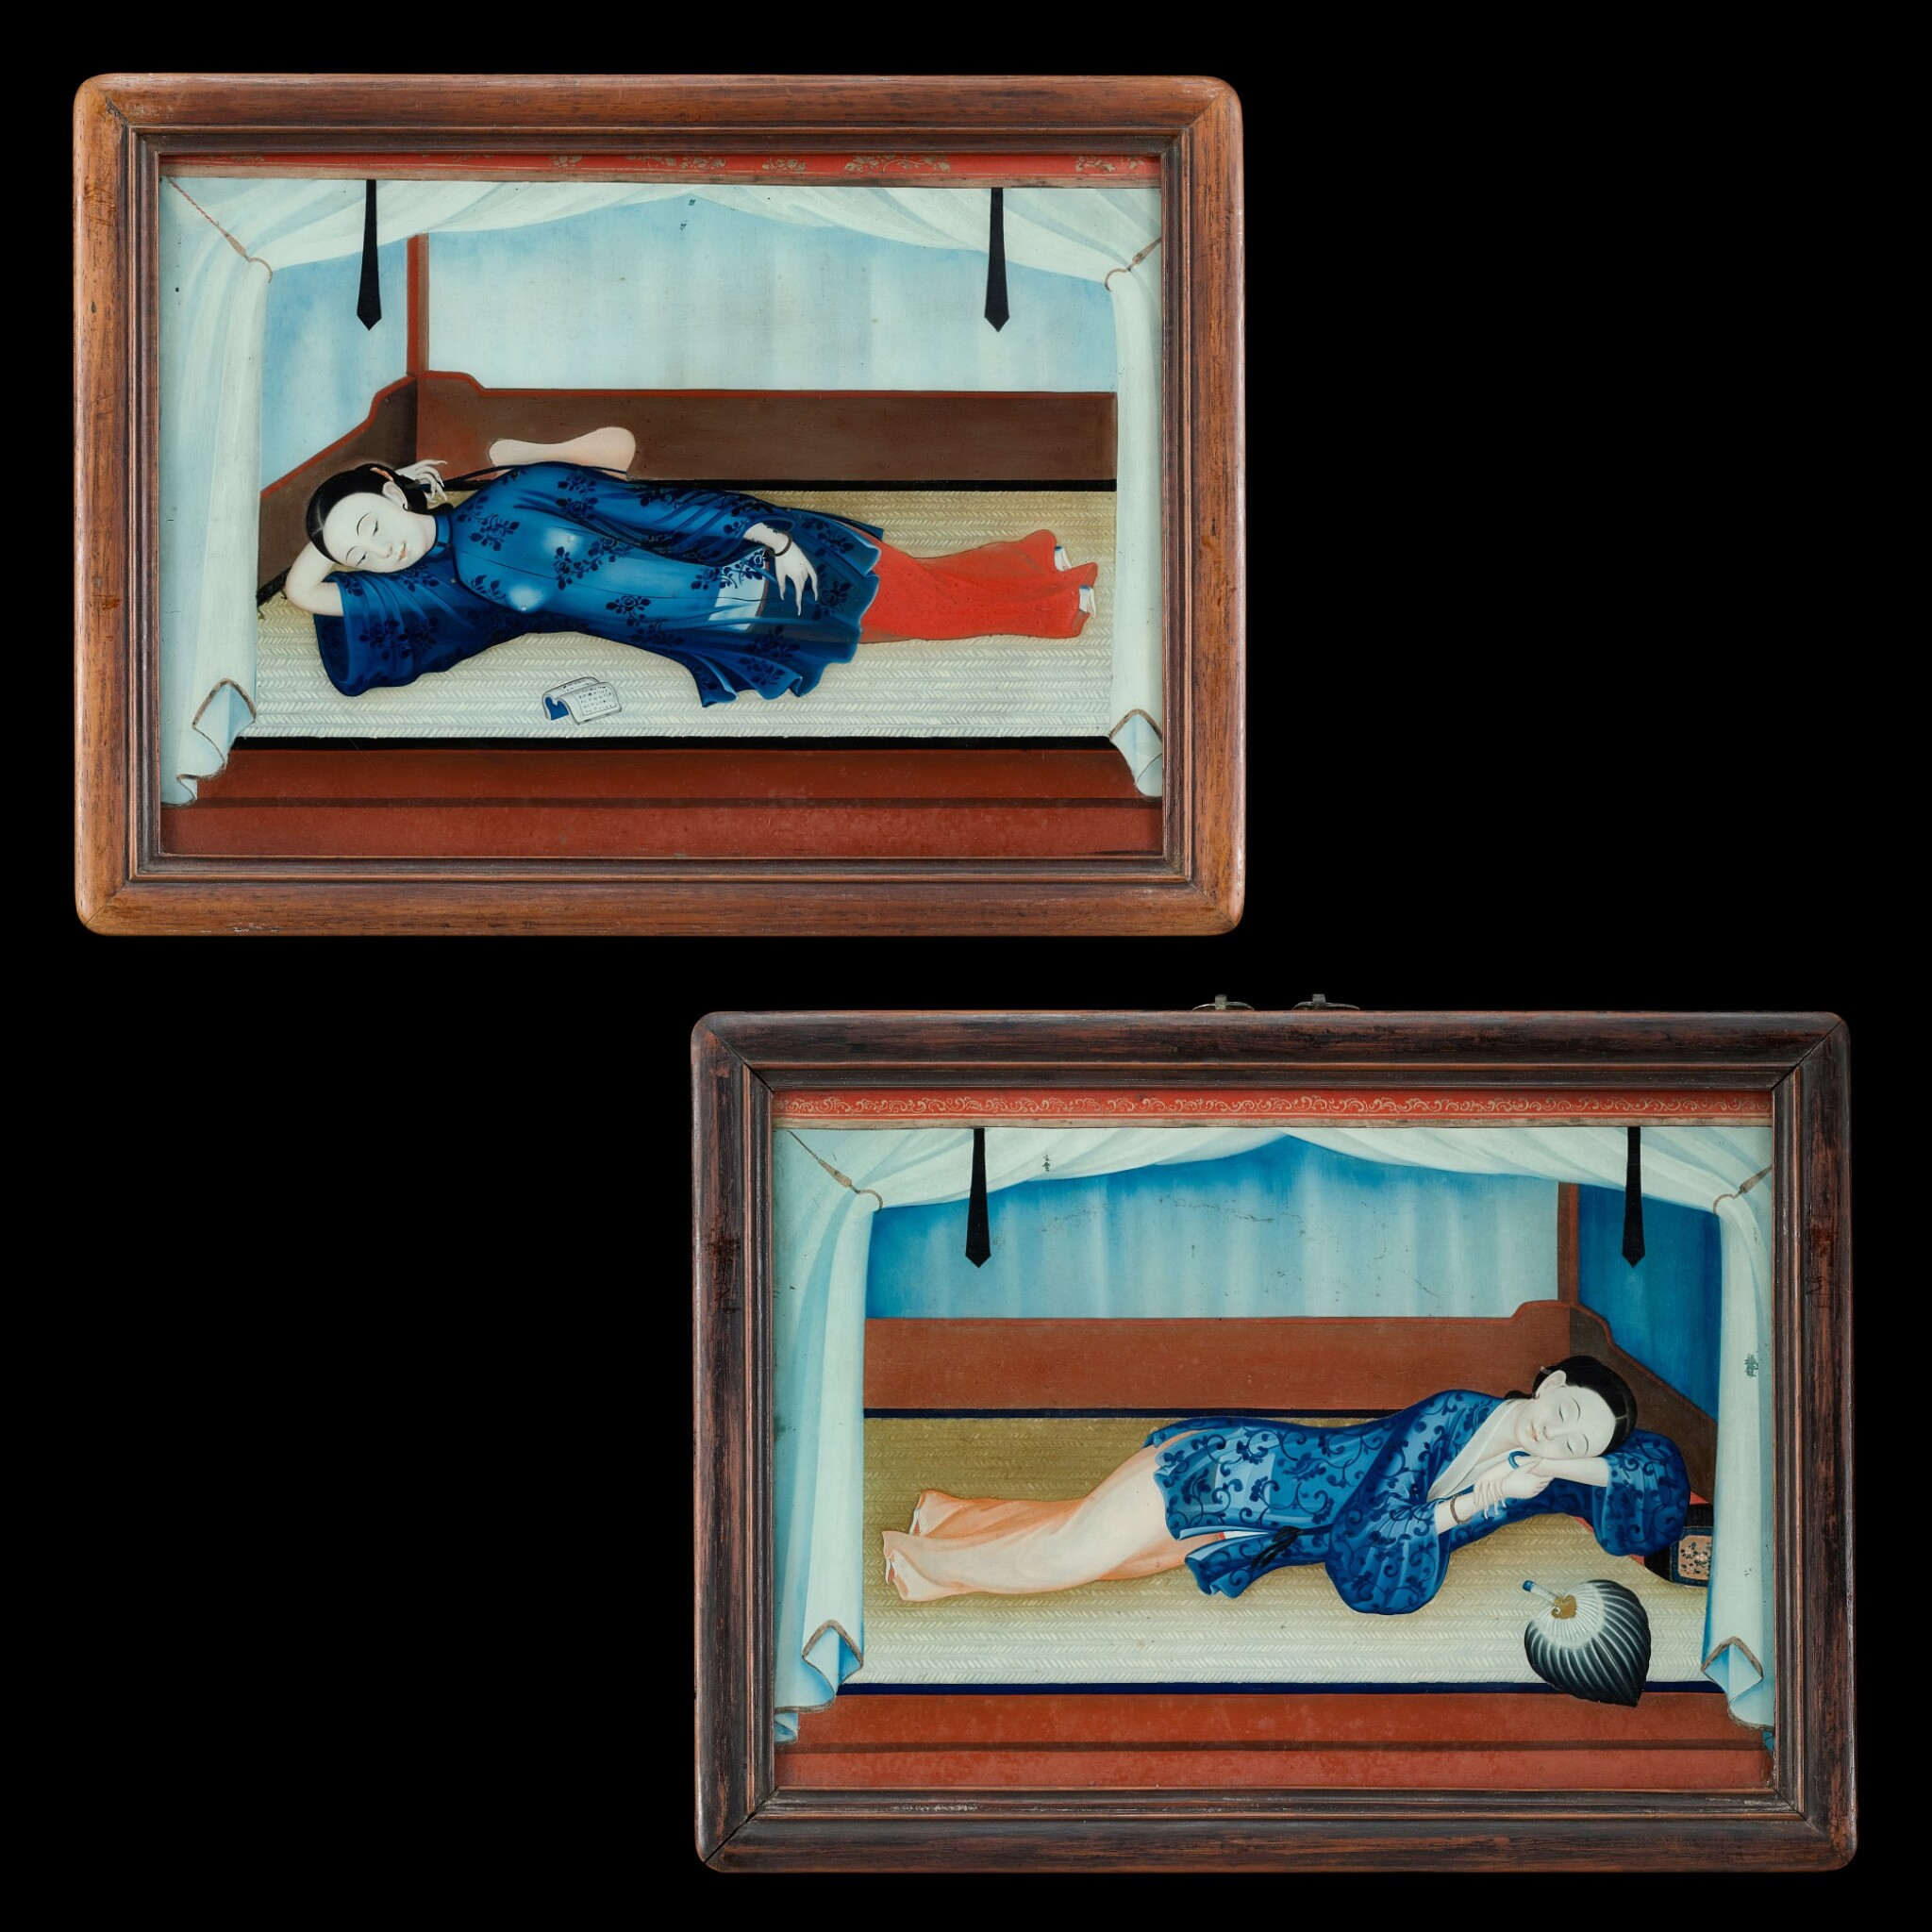 View full screen - View 1 of Lot 187. Chinese School, early 19th century Two Reclining Ladies on Day Bed | 中國畫派 十九世紀初    美人春睡圖一組兩幅   玻璃畫作 木框.